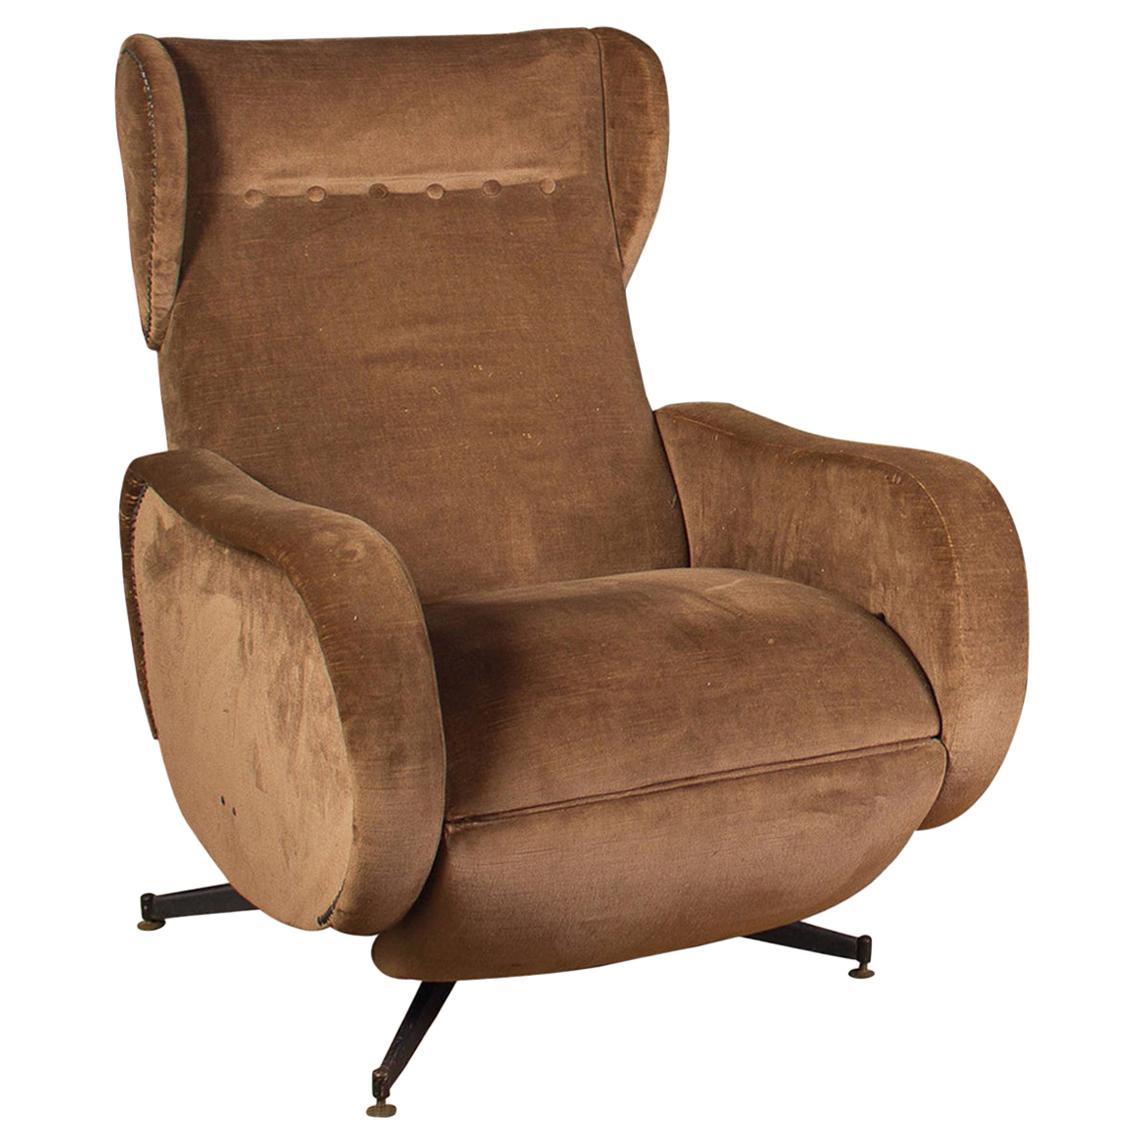 Italian Midcentury Reclinable Lounge Chair or Armchair, 1950